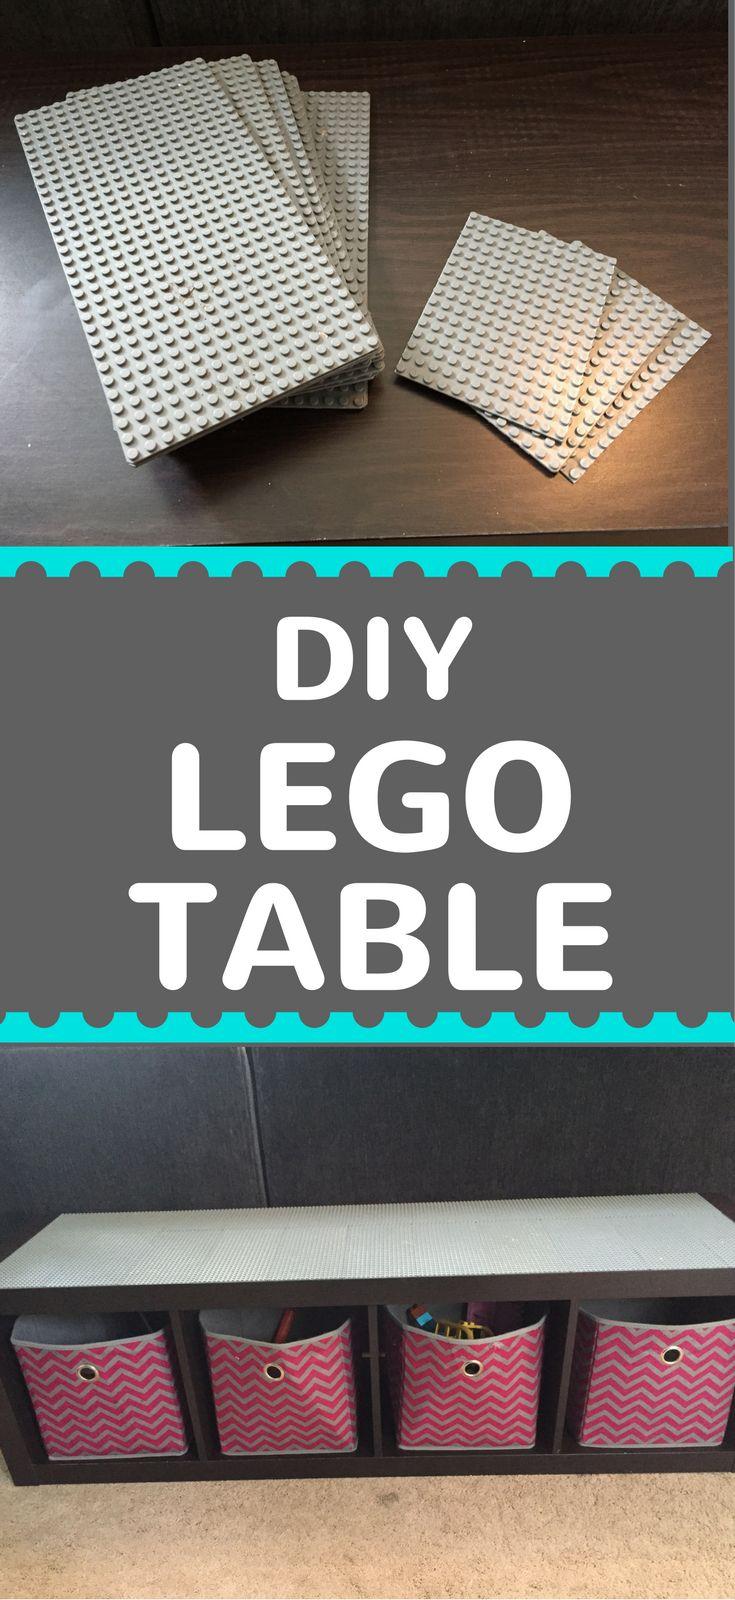 Boys Room Lego Ideas best 25+ lego organizing ideas on pinterest | lego boys rooms